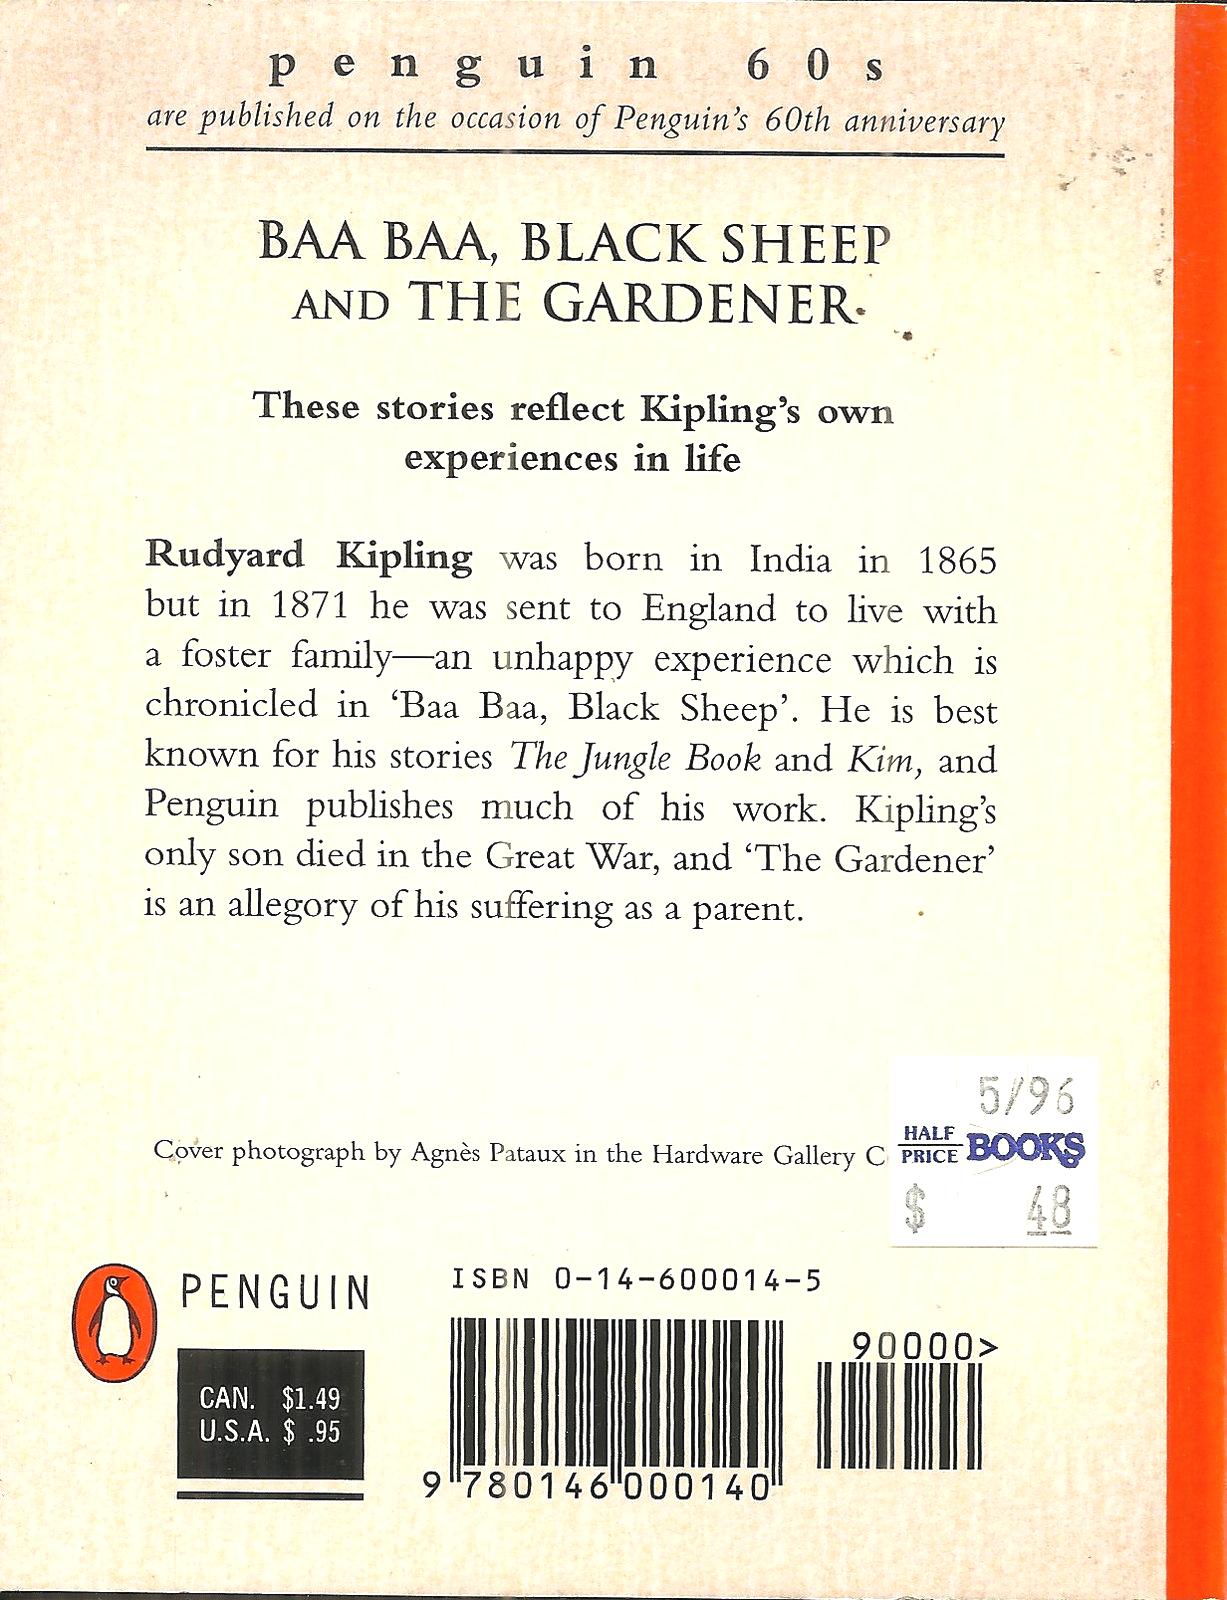 BAA BAA BLACK SHEEP Rudyard Kipling - + THE GARDENER - 2 SHORT STORIES - 1995